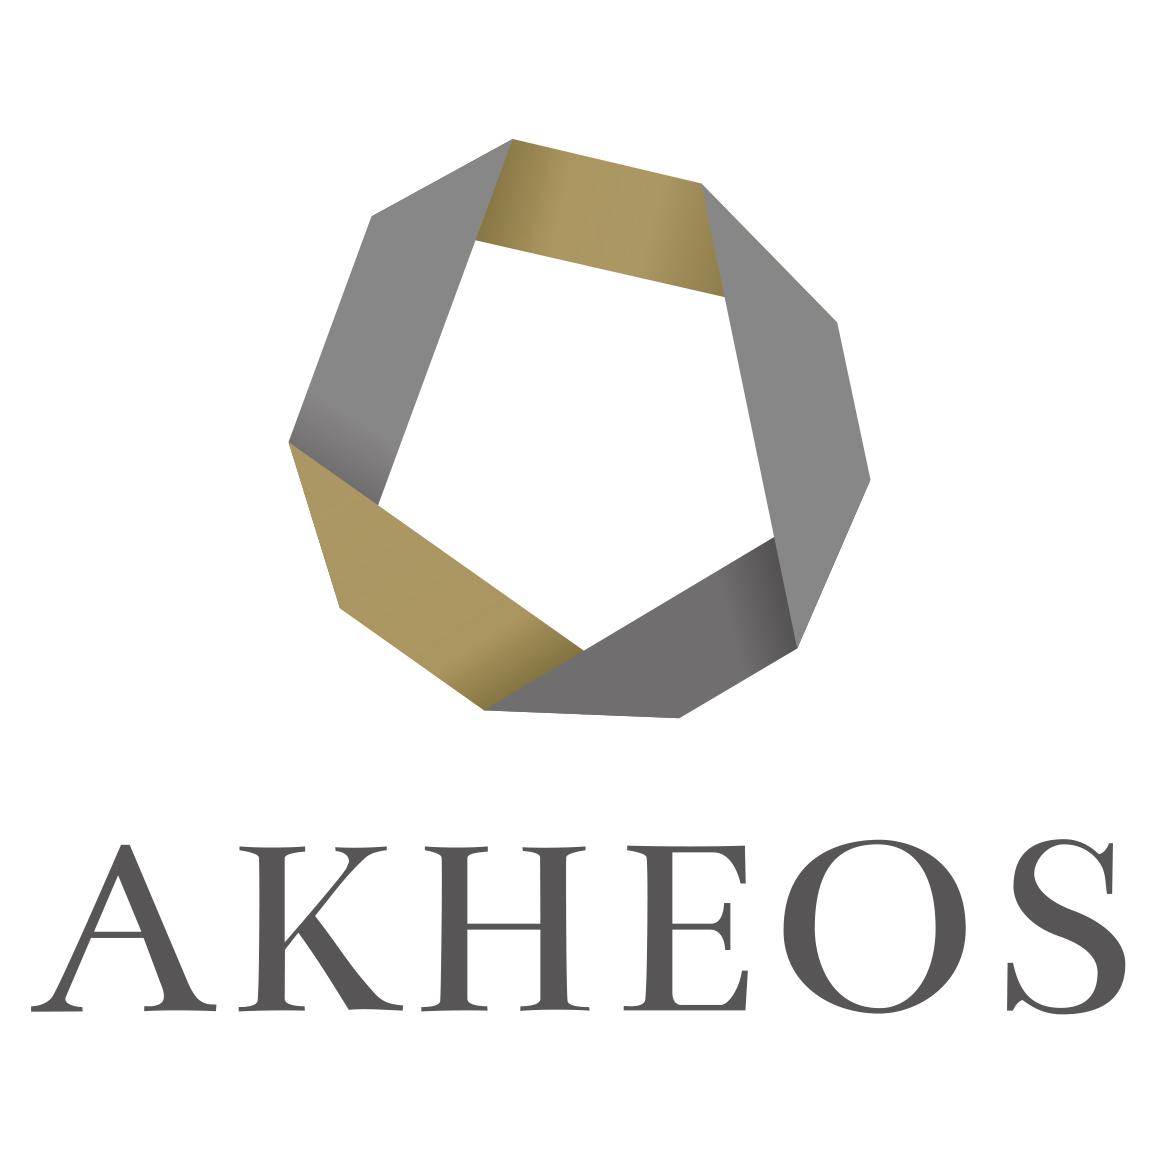 AKHEOS - LOGO 2 niveaux.jpg